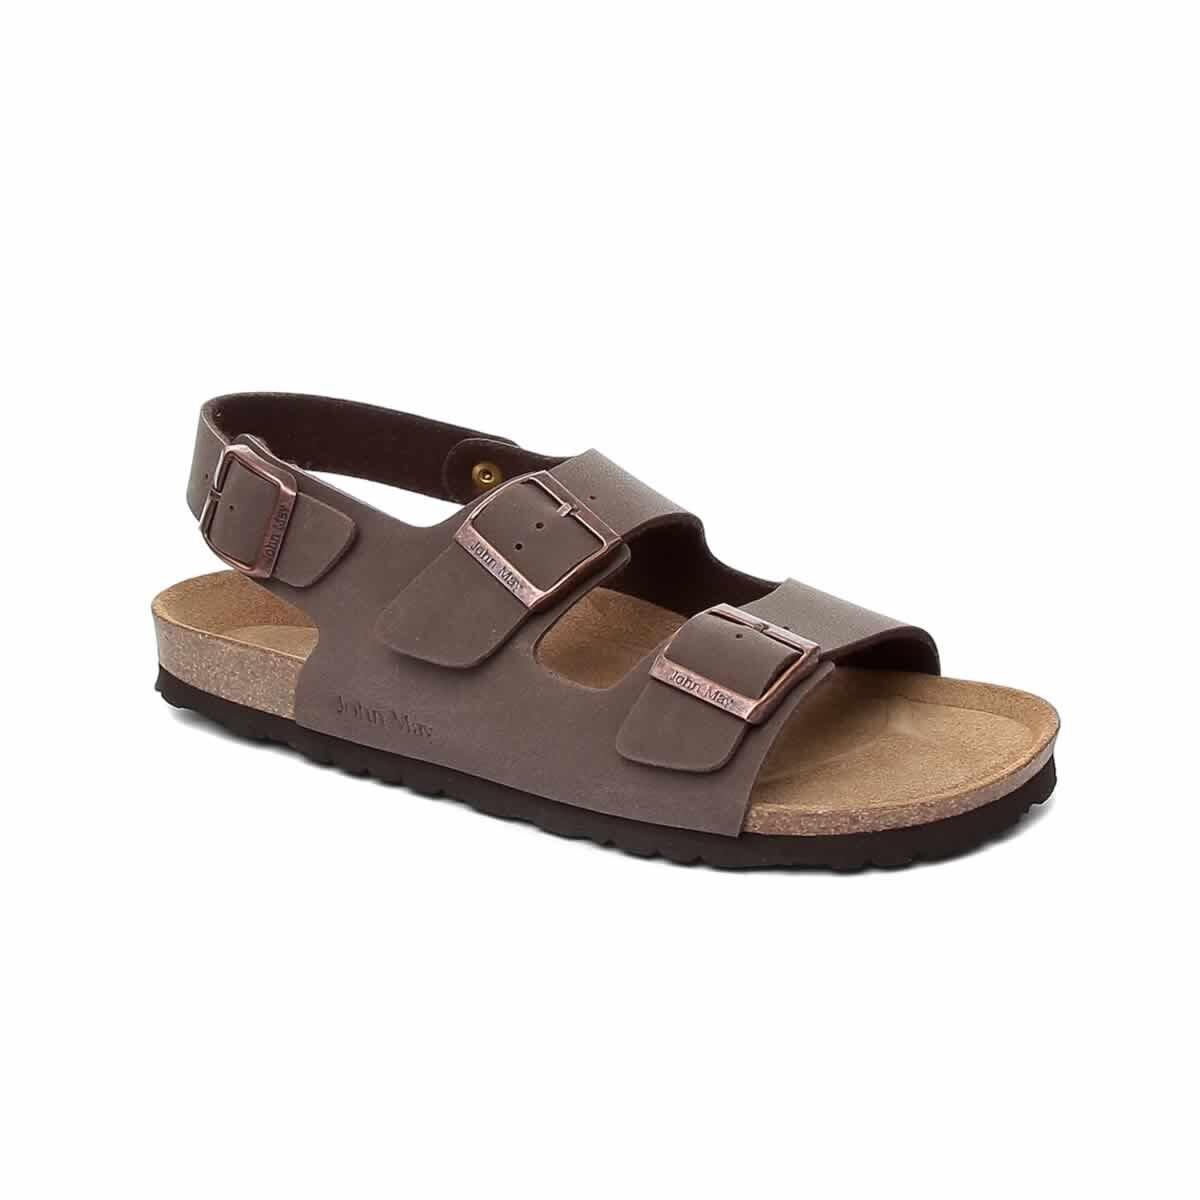 Kahverengi Erkek Sandalet 1JMYM2018152